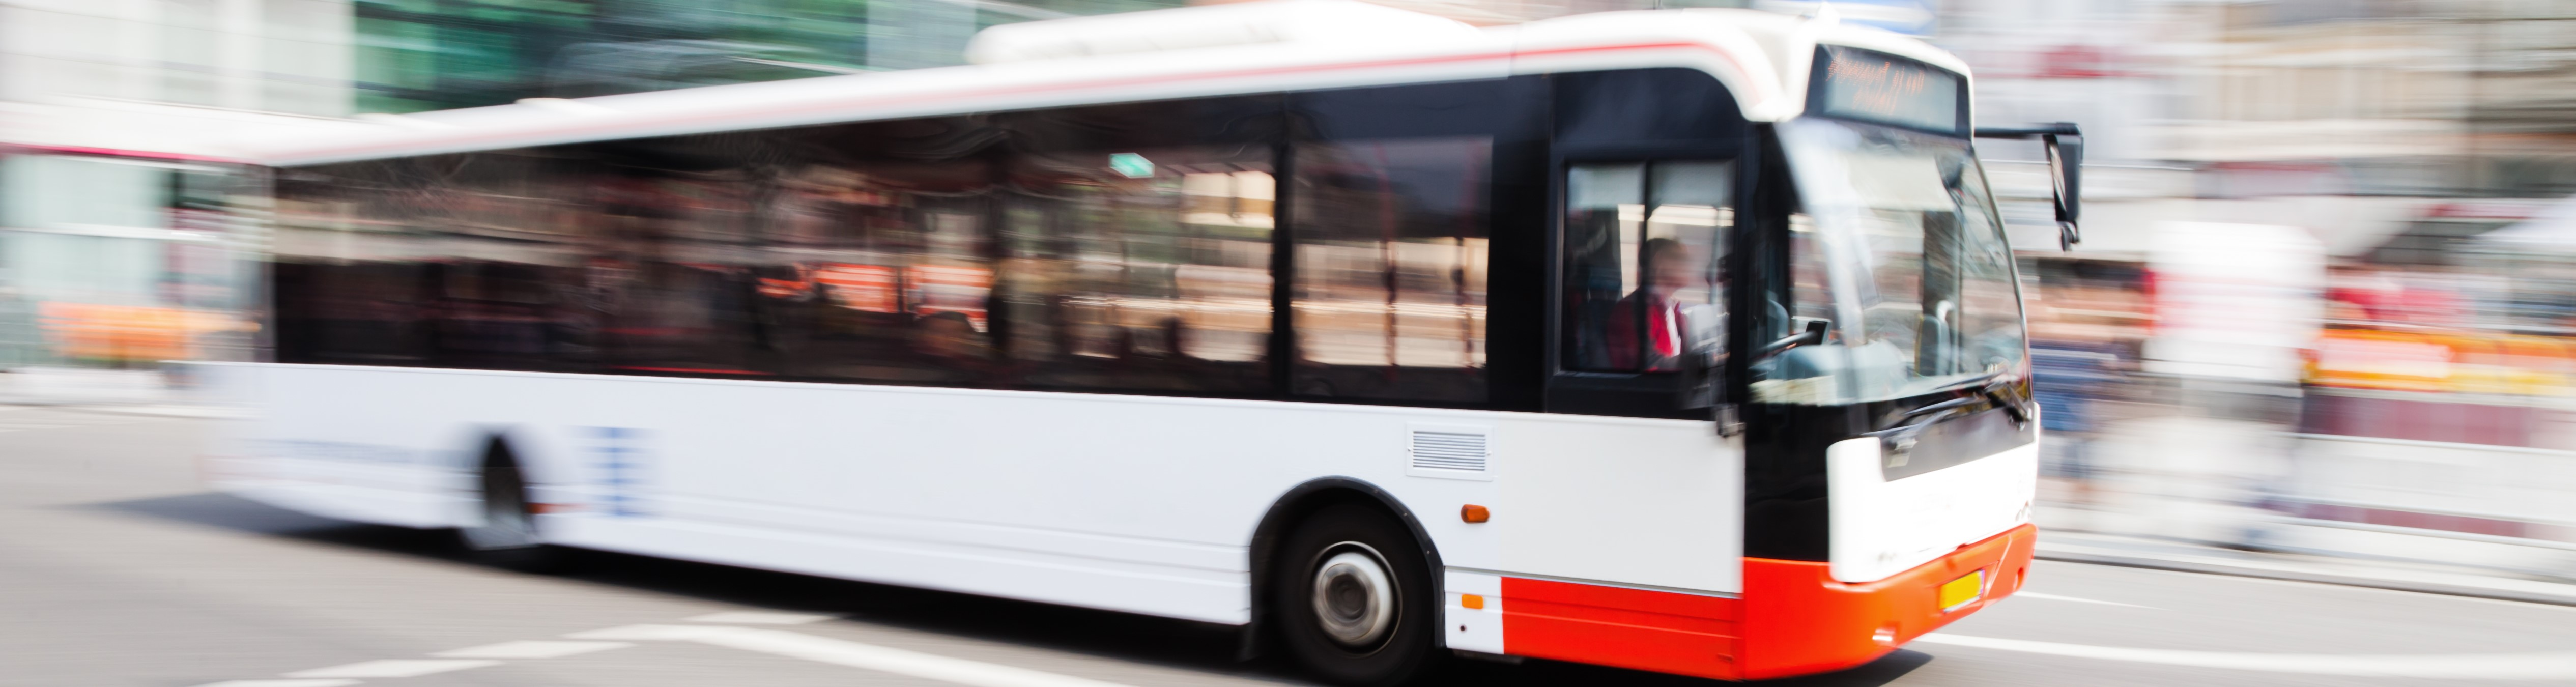 code 95 chauffeur openbaar vervoer